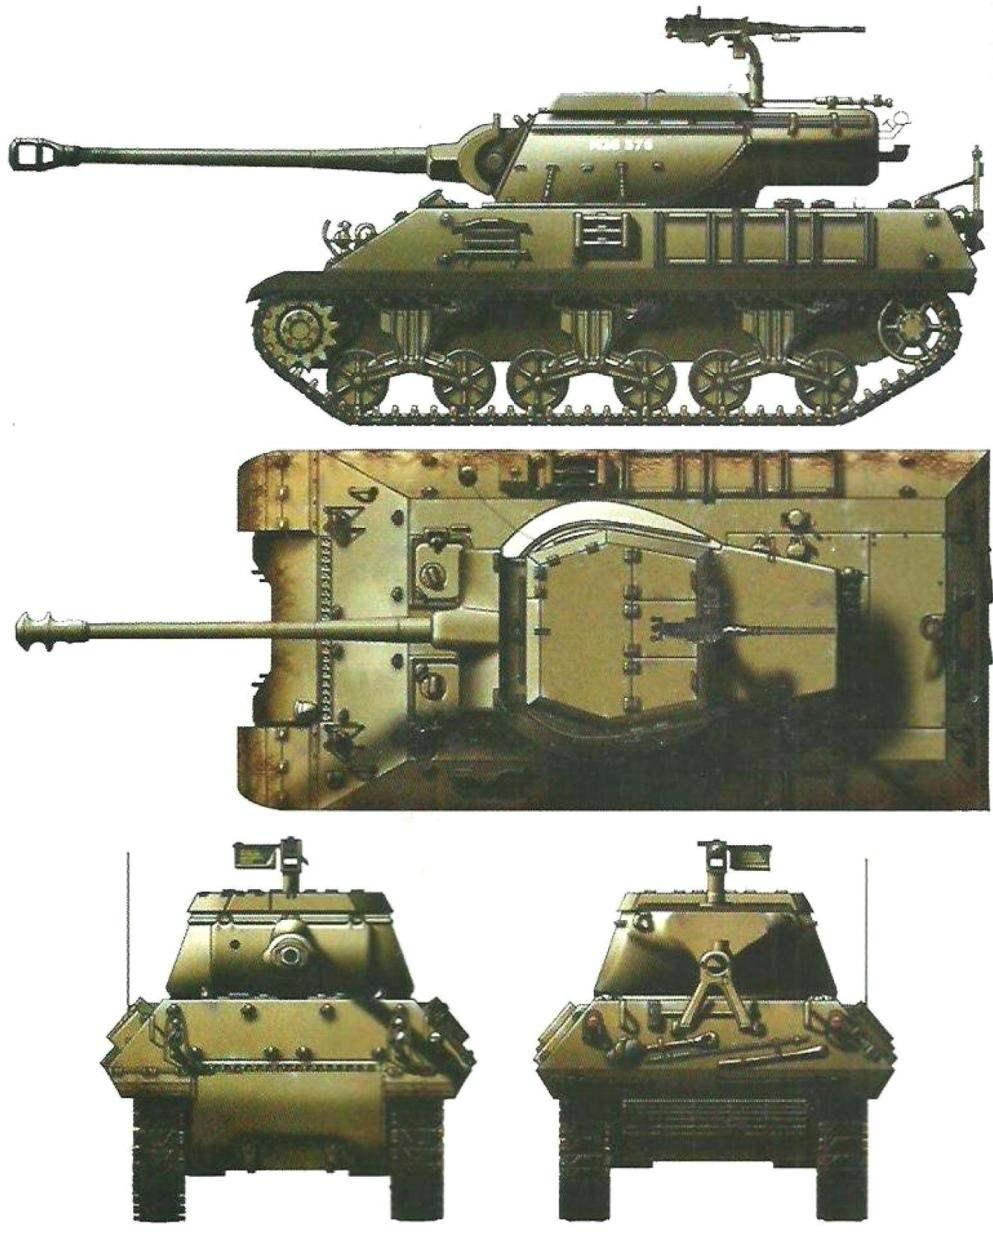 American tank destroyer M36B2